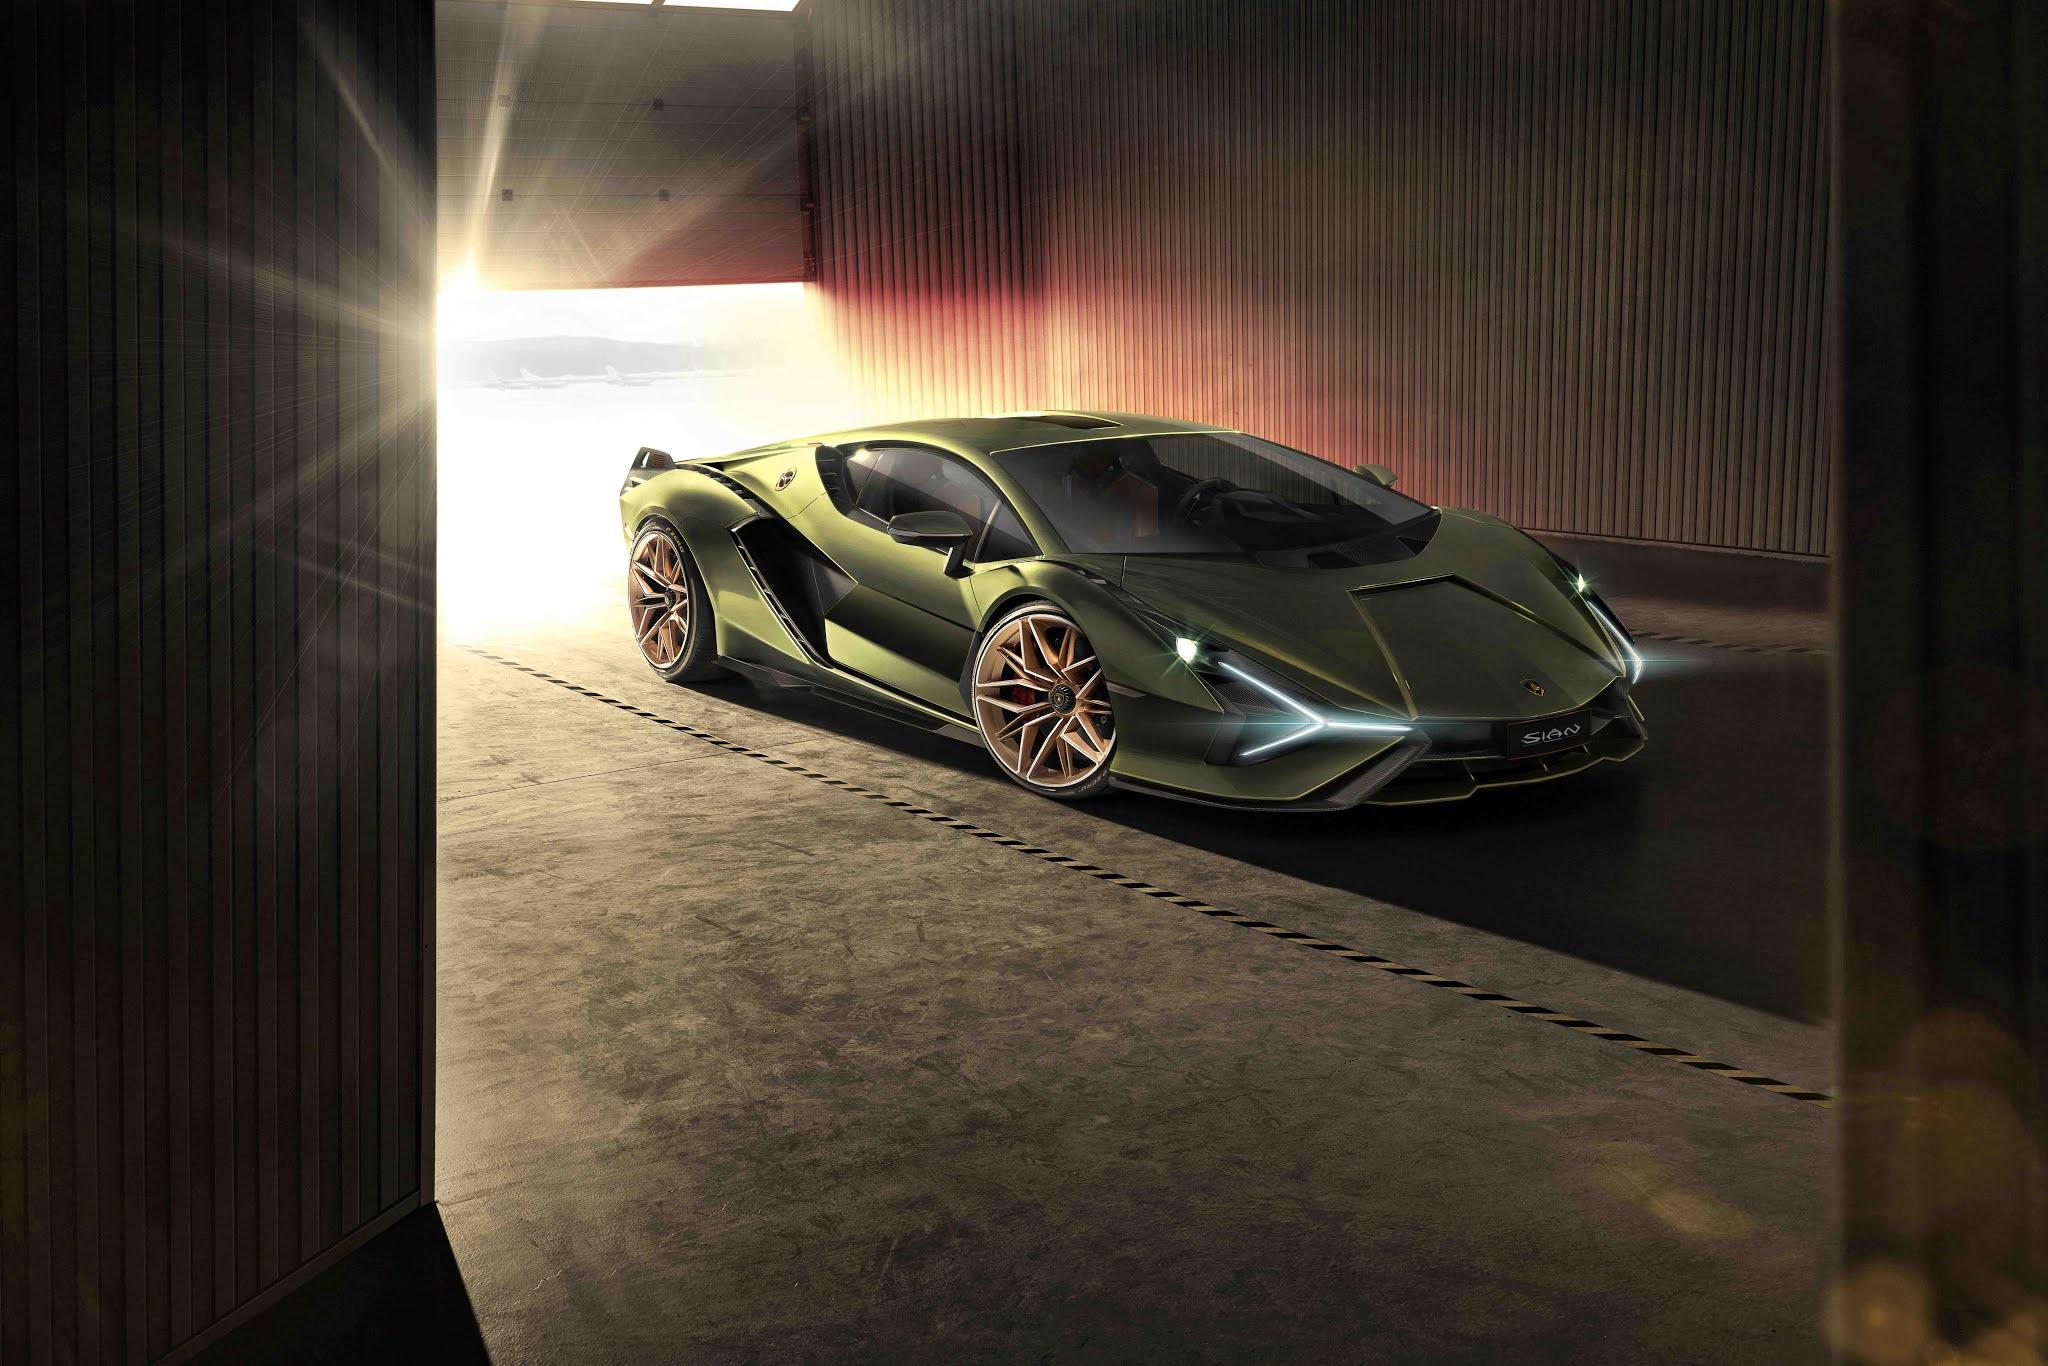 Lamborghini%2BSia%25CC%2581n%2BFKP%2B37_1